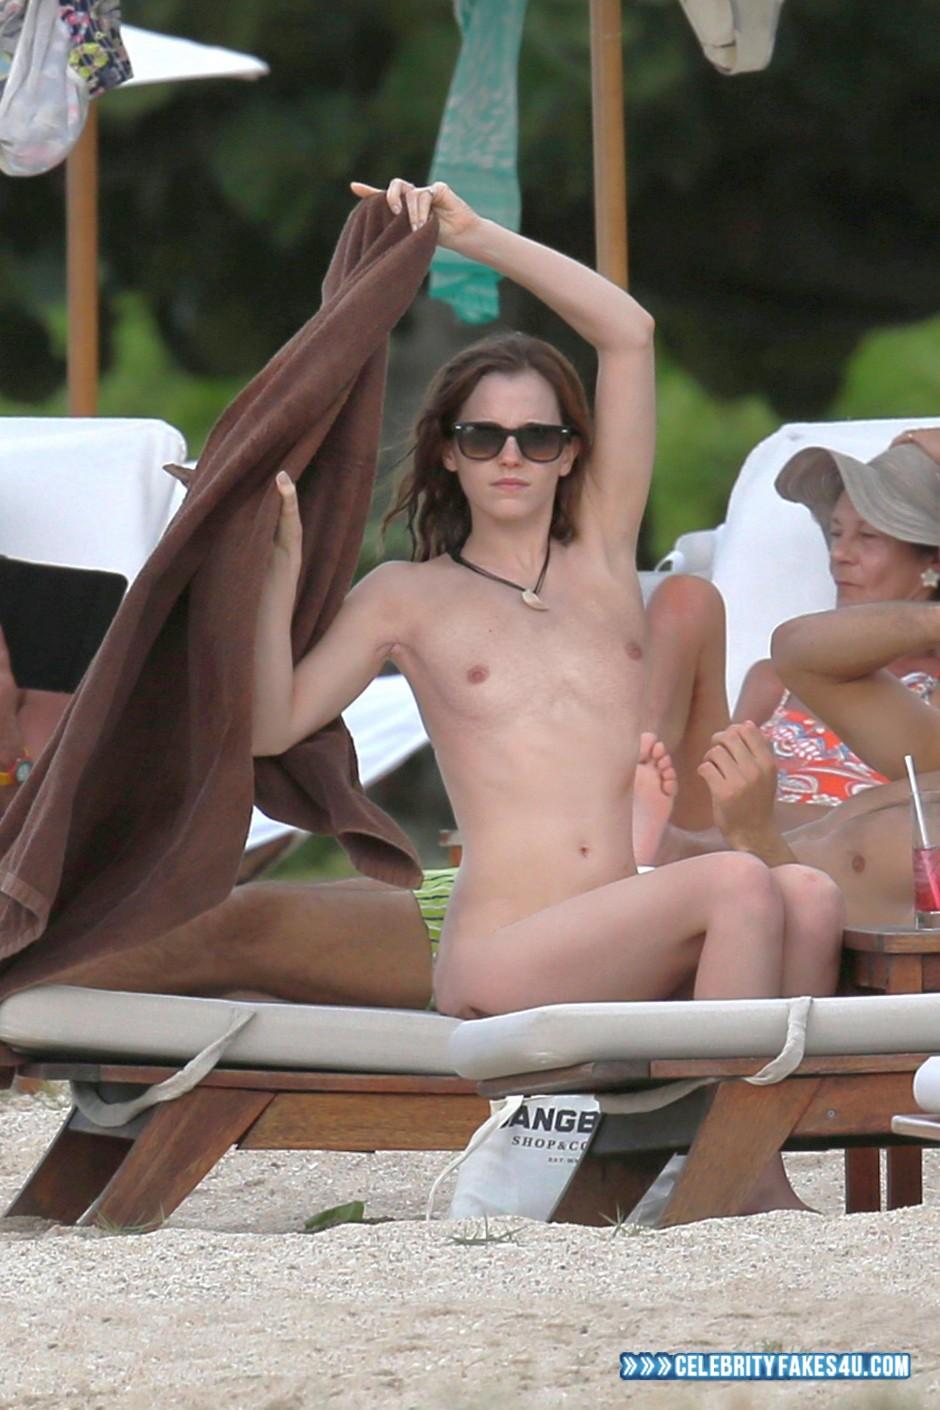 Emma Watson Fake, Beach, Nude, Outdoor, Public, Tits, Porn